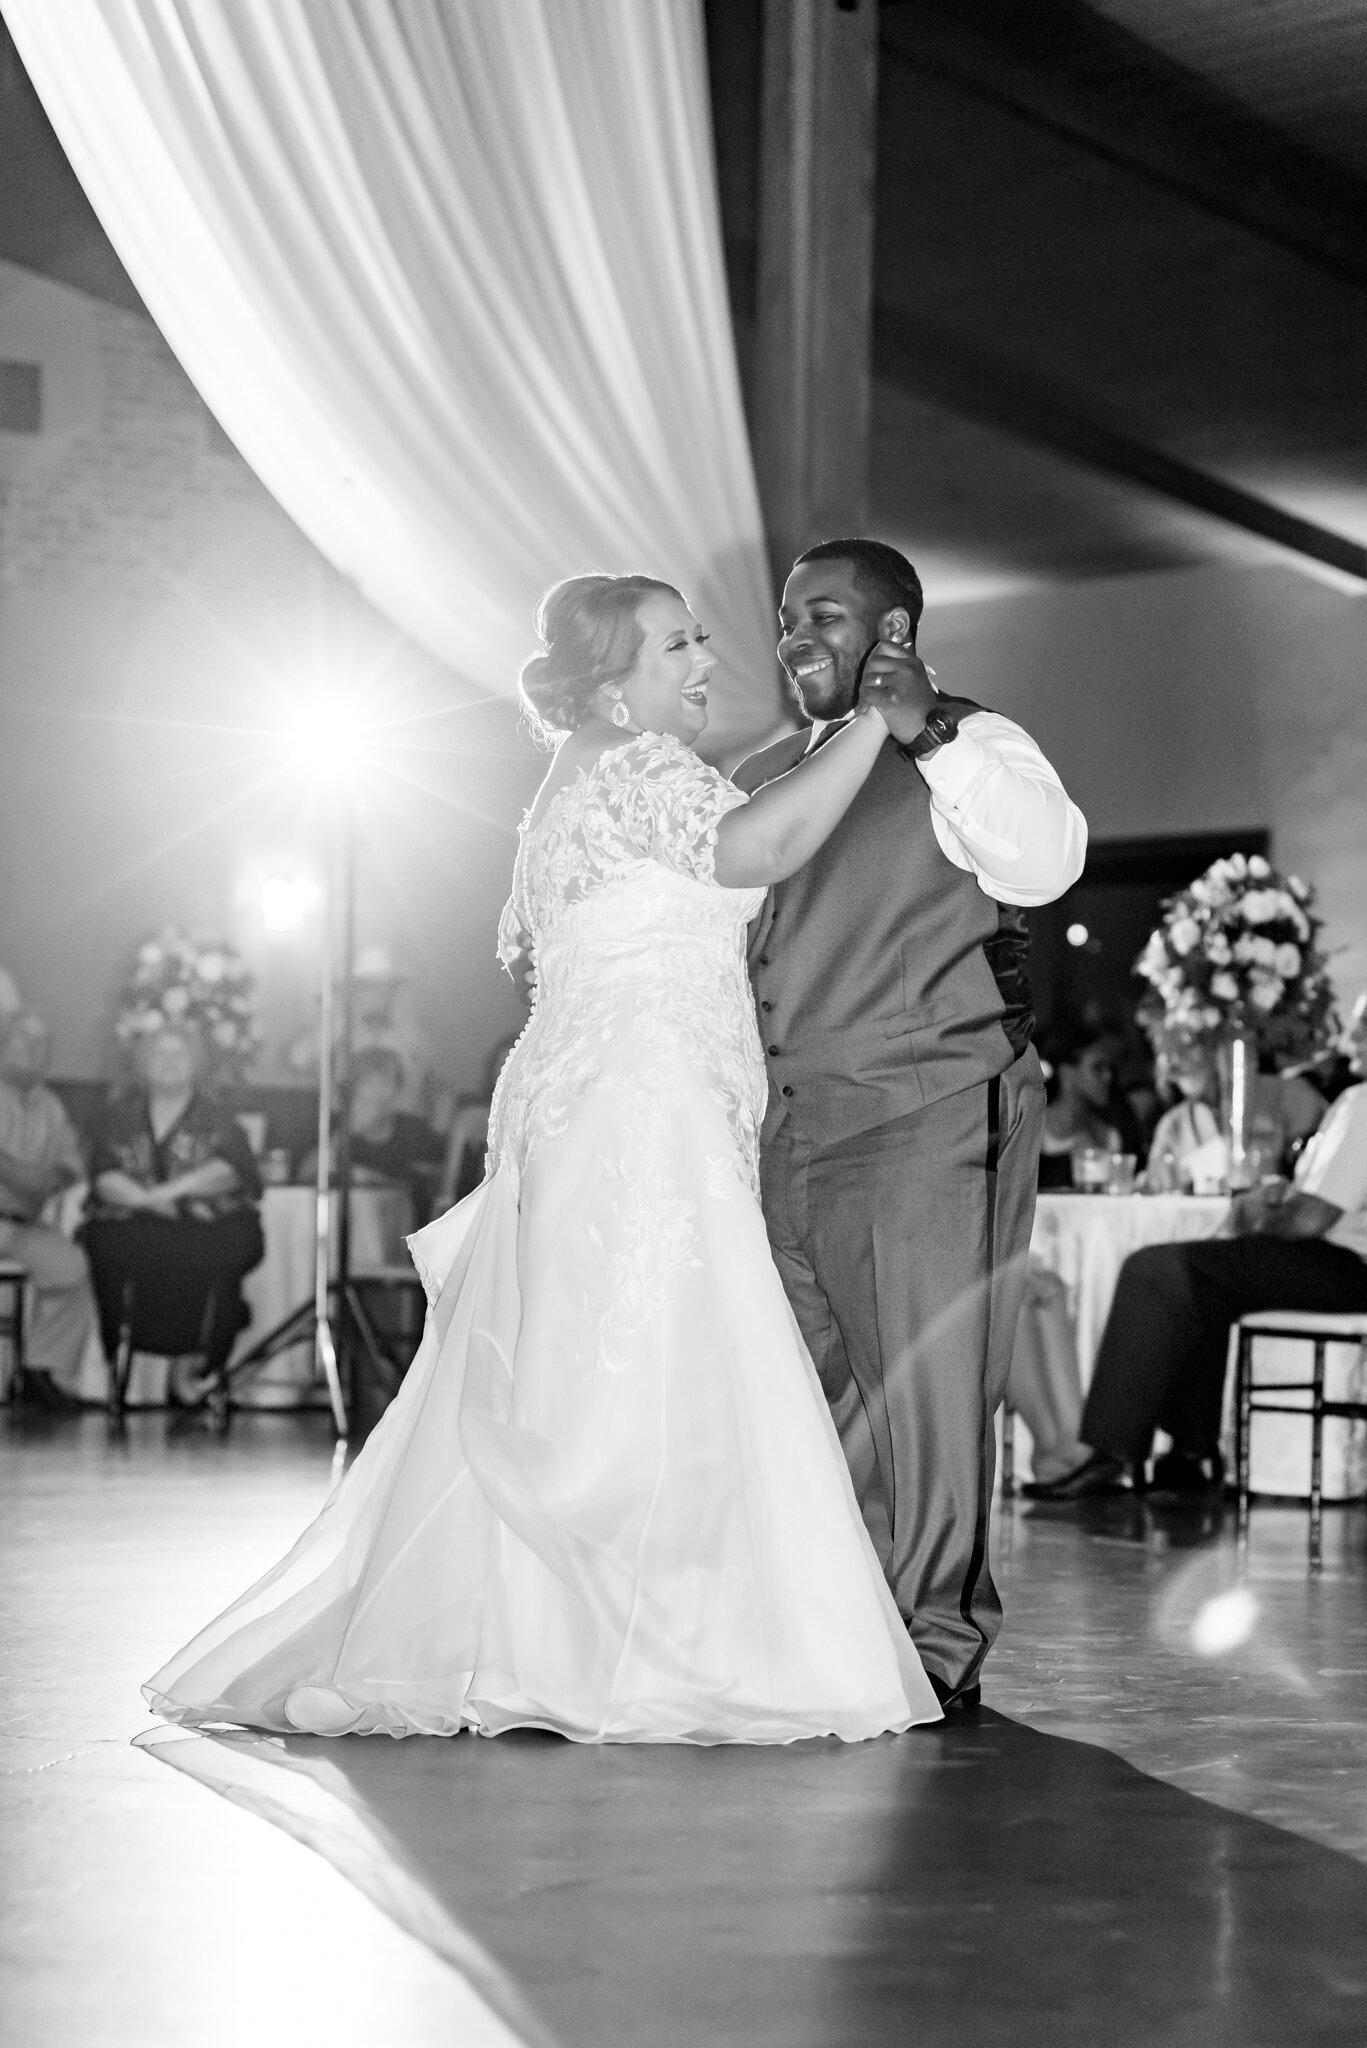 San Antonio Austin Boerne New Braunfels Texas Wedding Engagement Photographer Photography Hill Country Texas Chandelier of Gruene Wedding Summer Wedding Purple Mauve Gold Rustic Chic Wedding San Antonio Austin Texas photographer 71